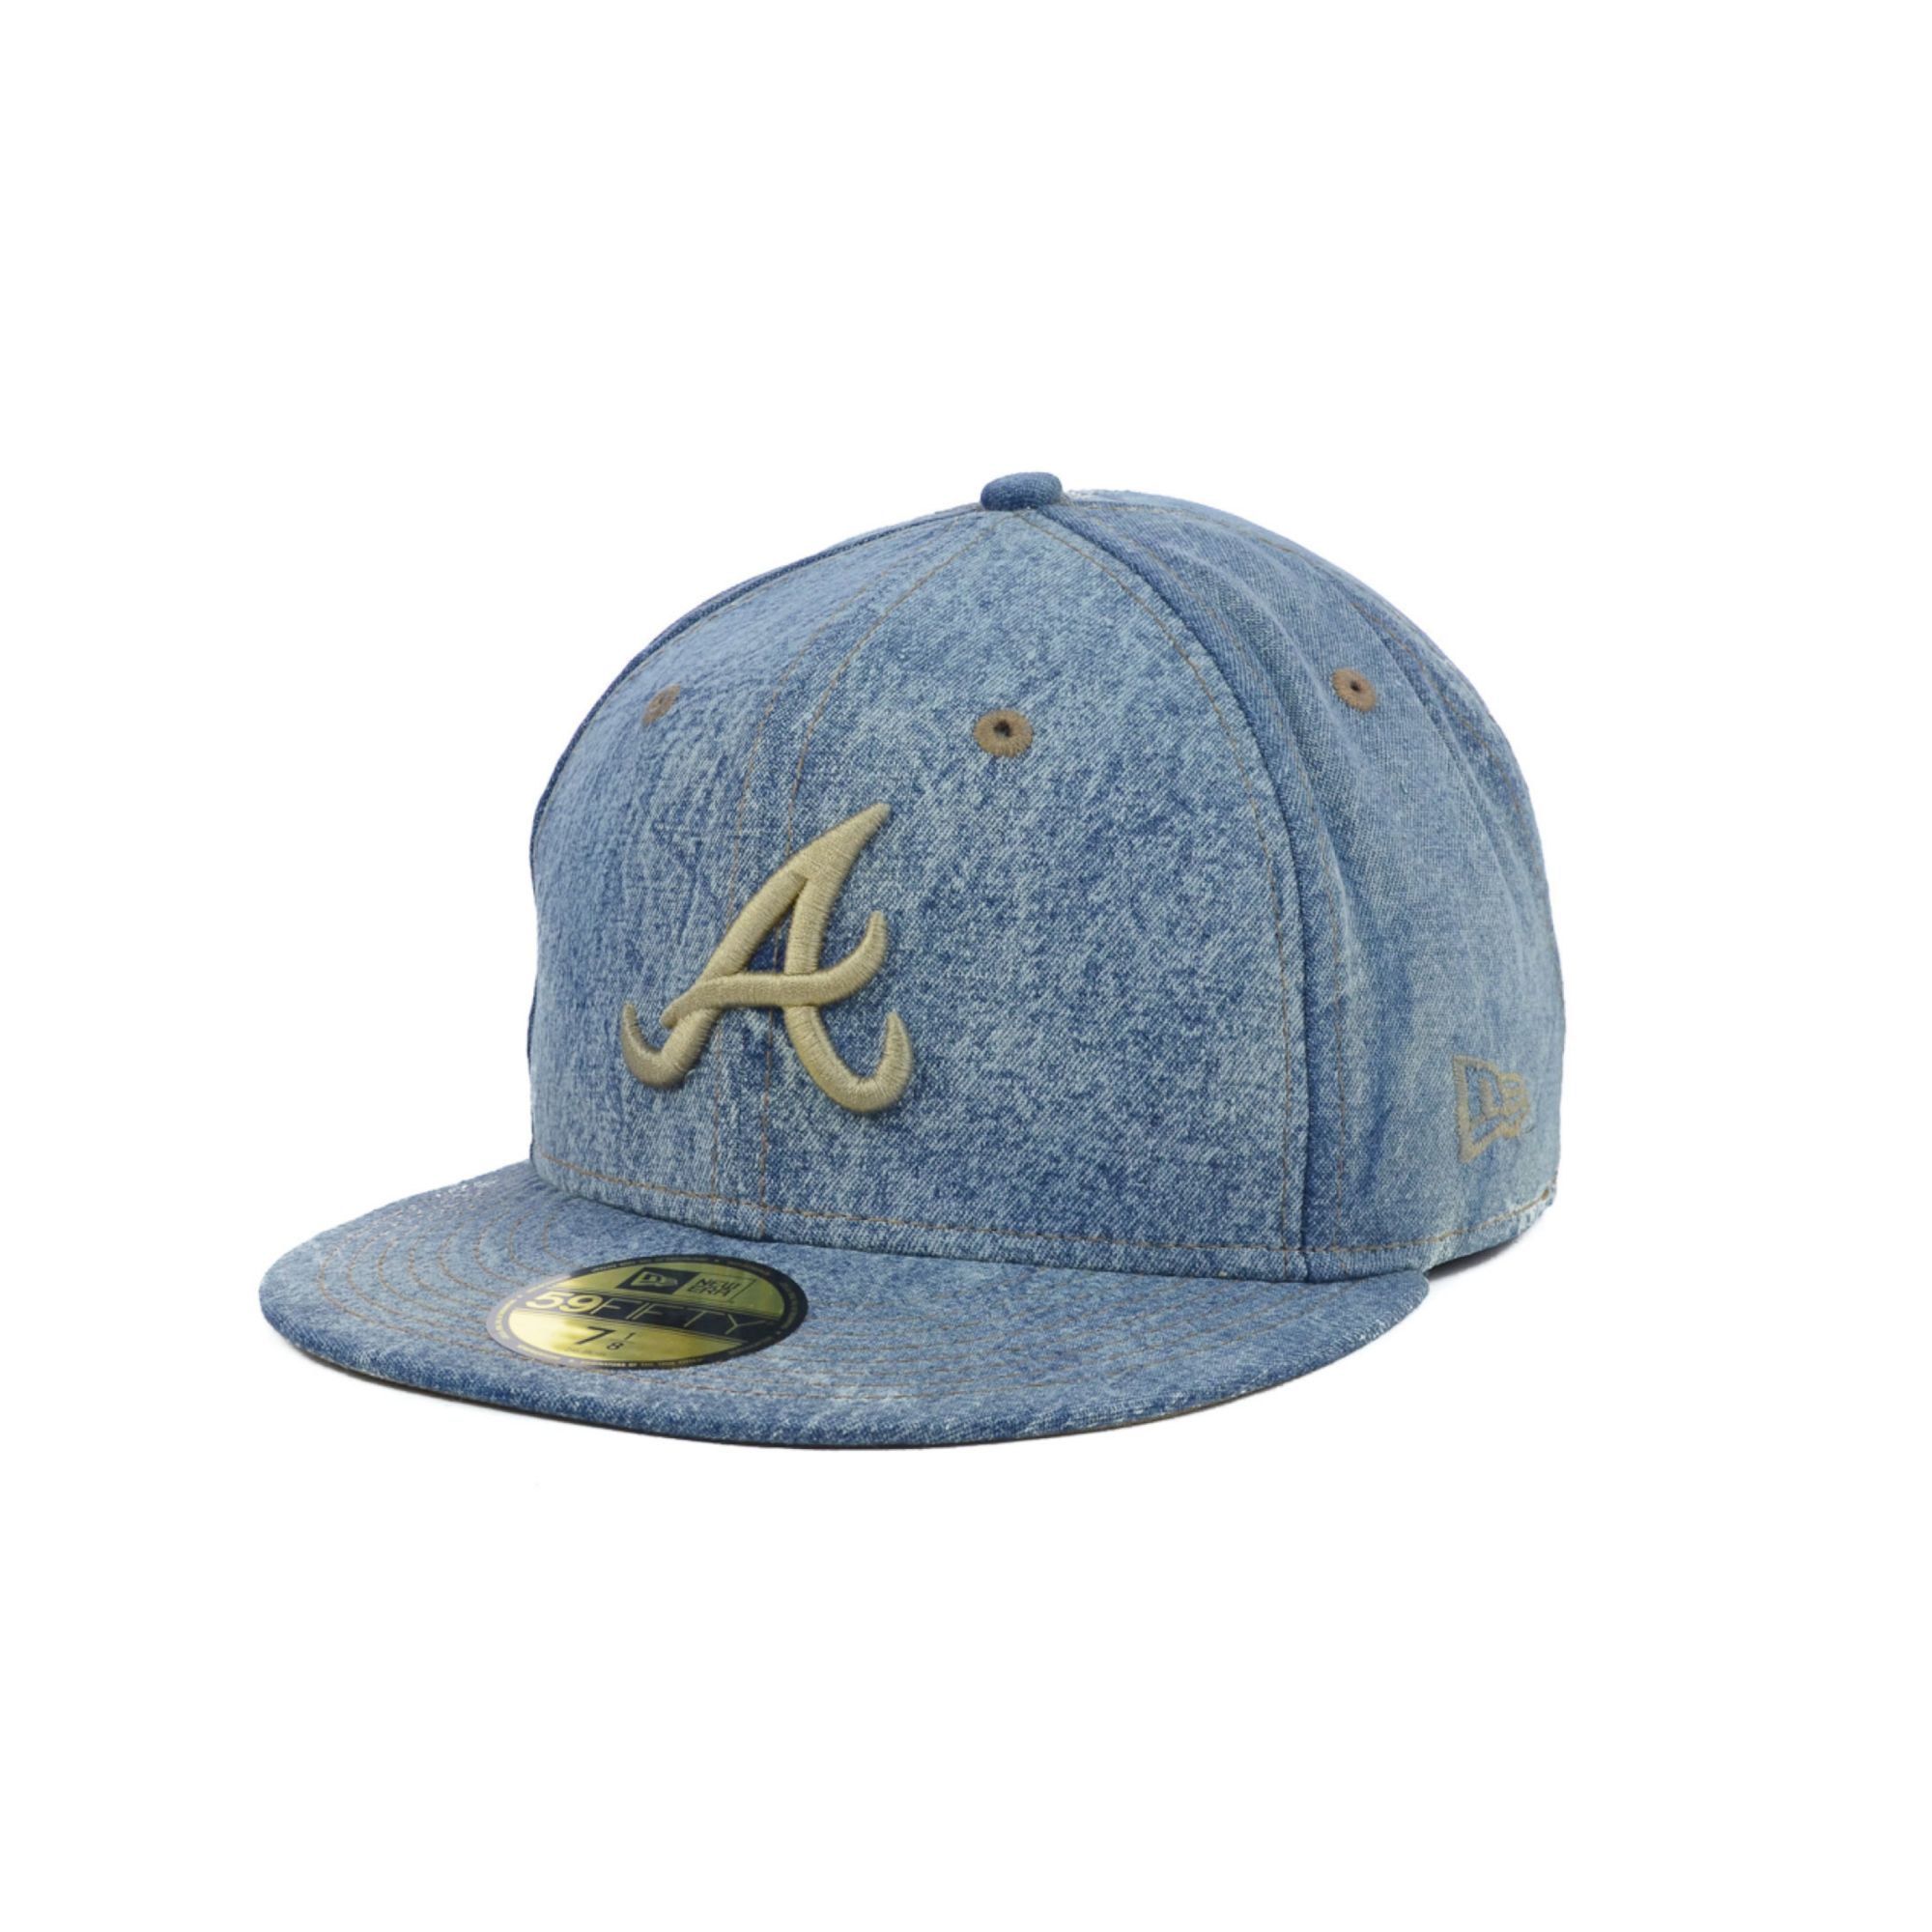 Braves Hats: Ktz Atlanta Braves Mlb Classic Denim 59fifty Cap In Blue